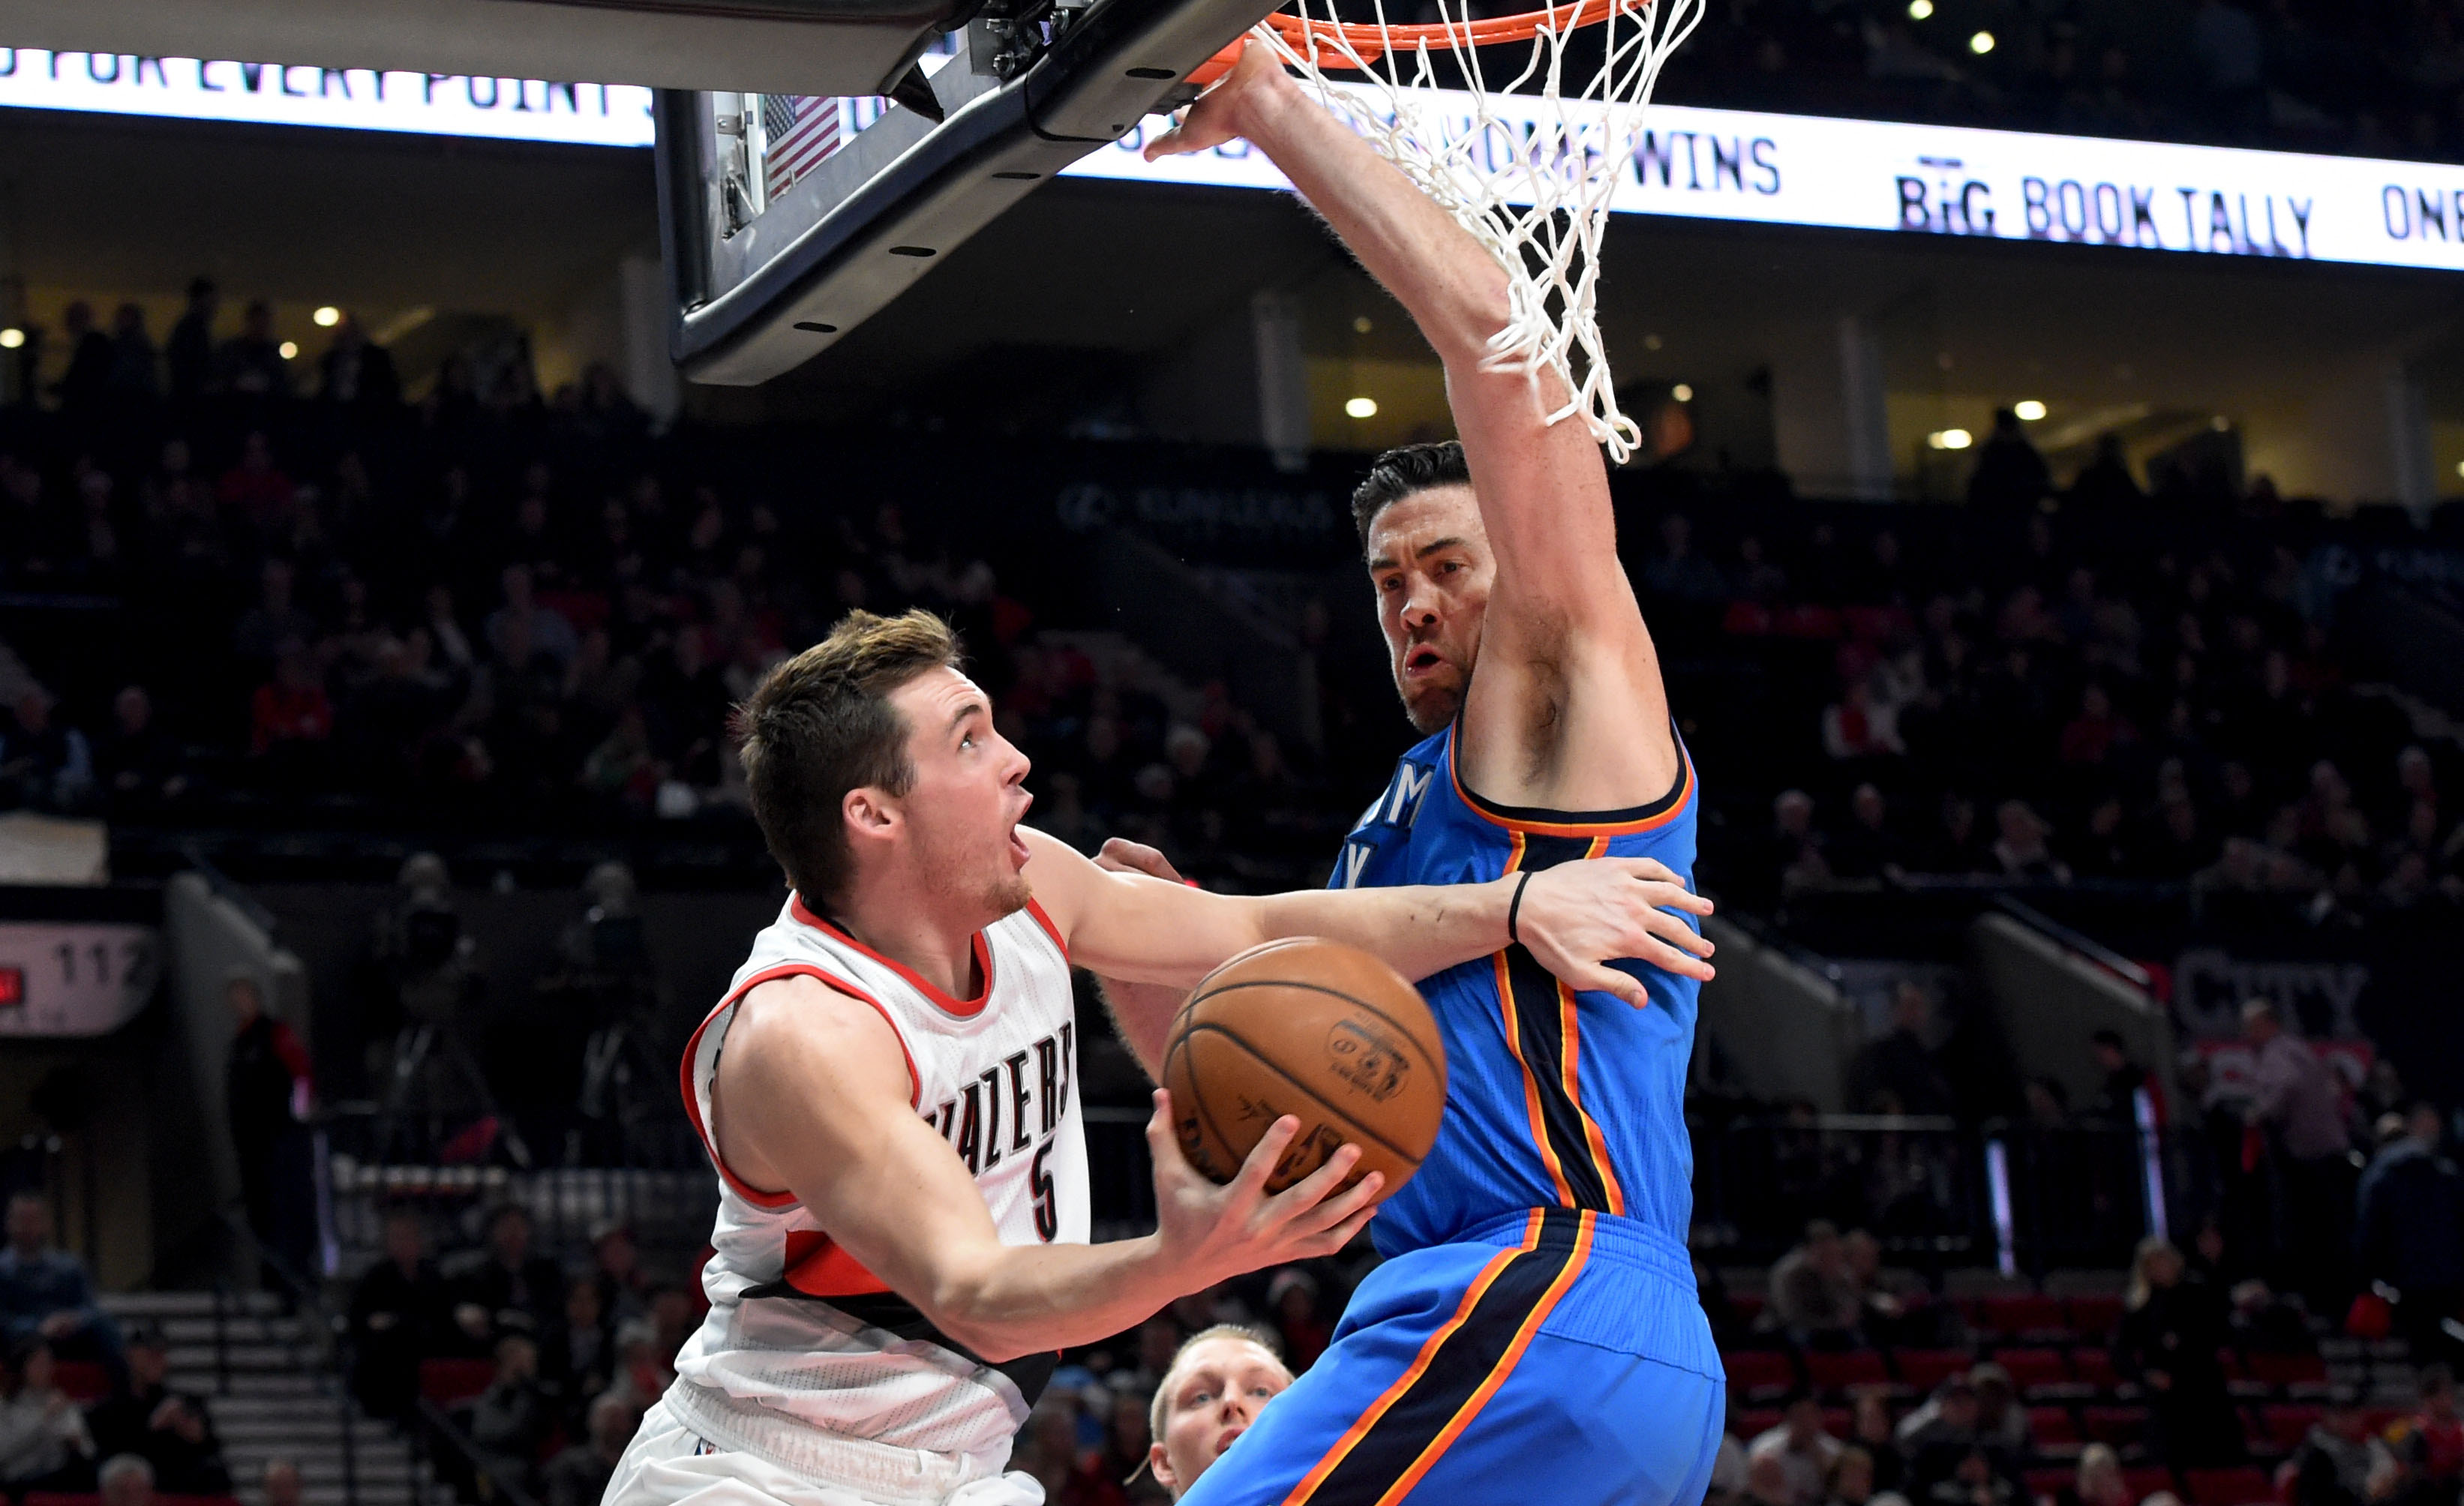 Dec 13 2016 Portland Or Usa Trail Blazers Guard Pat Connaughton 5 Drives To The Basket On Oklahoma City Thunder Forward Nick Collison 4